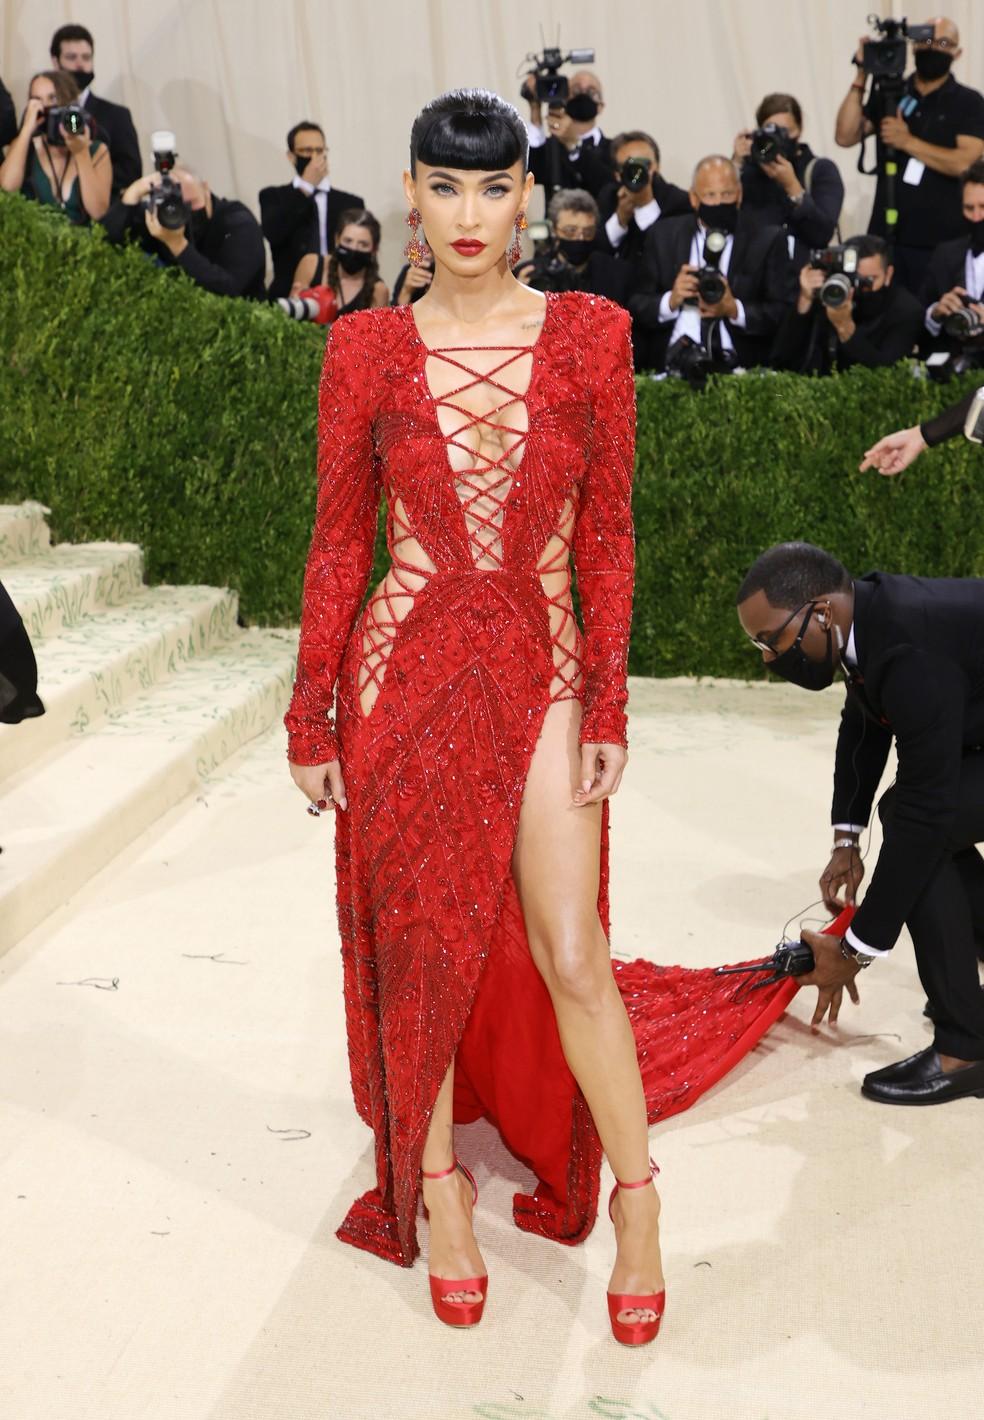 Megan Fox no Met Gala 2021 — Foto: Mike Coppola/Getty Images